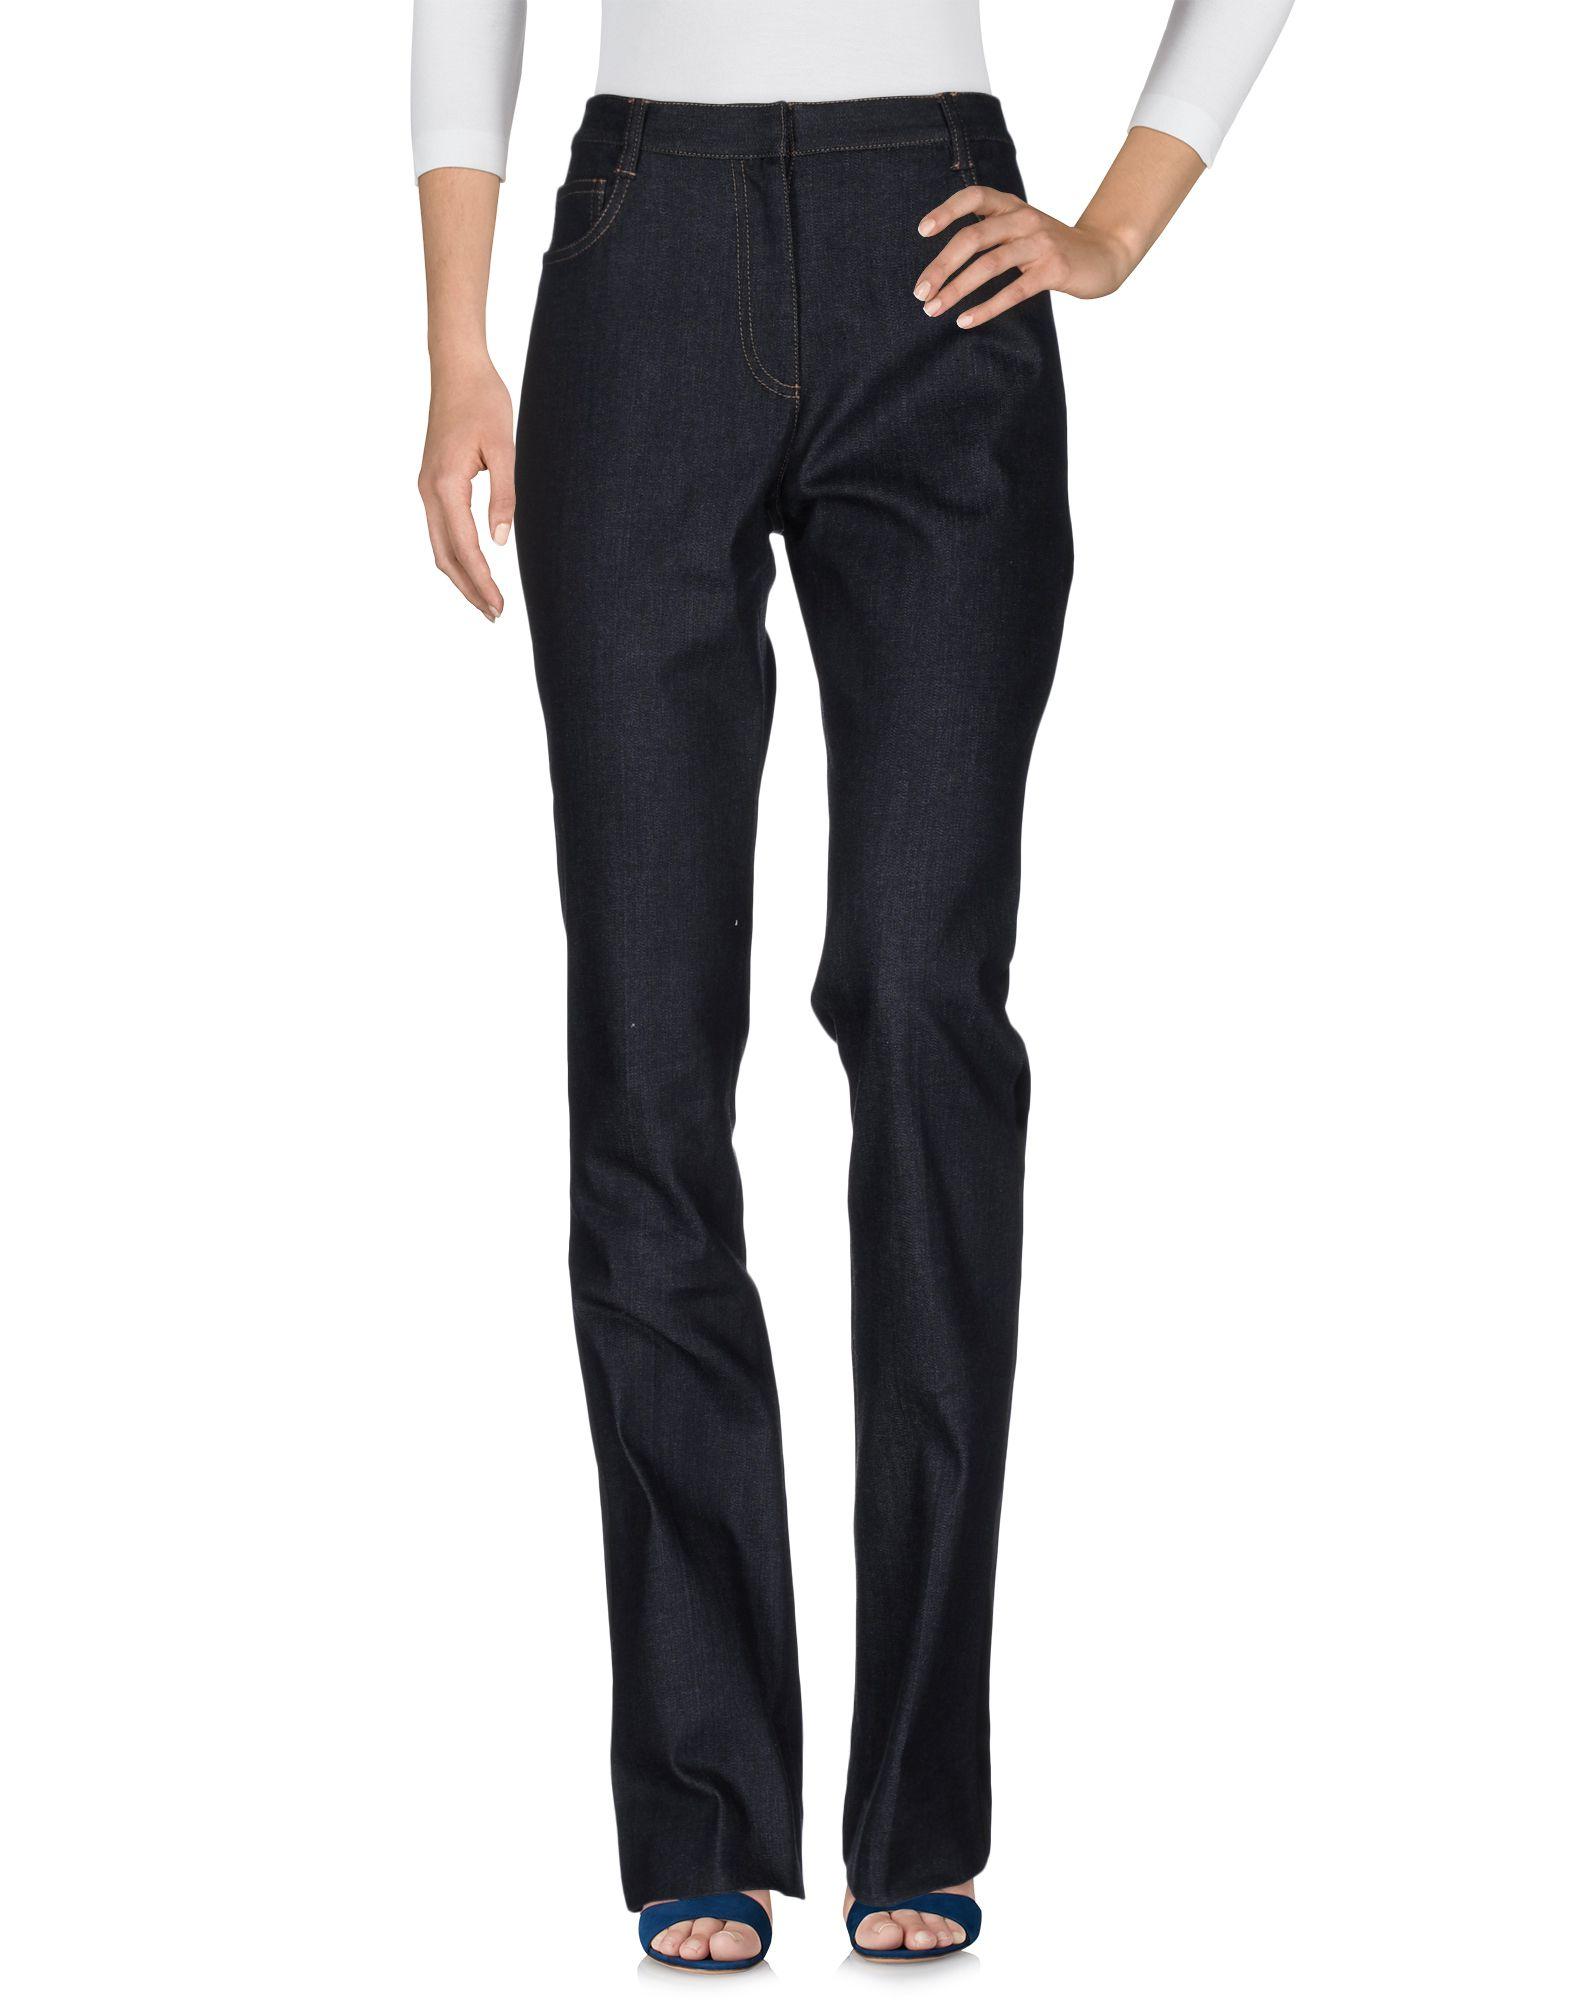 Pantaloni Jeans Miu Miu Donna - Acquista online su vZ9COs6B